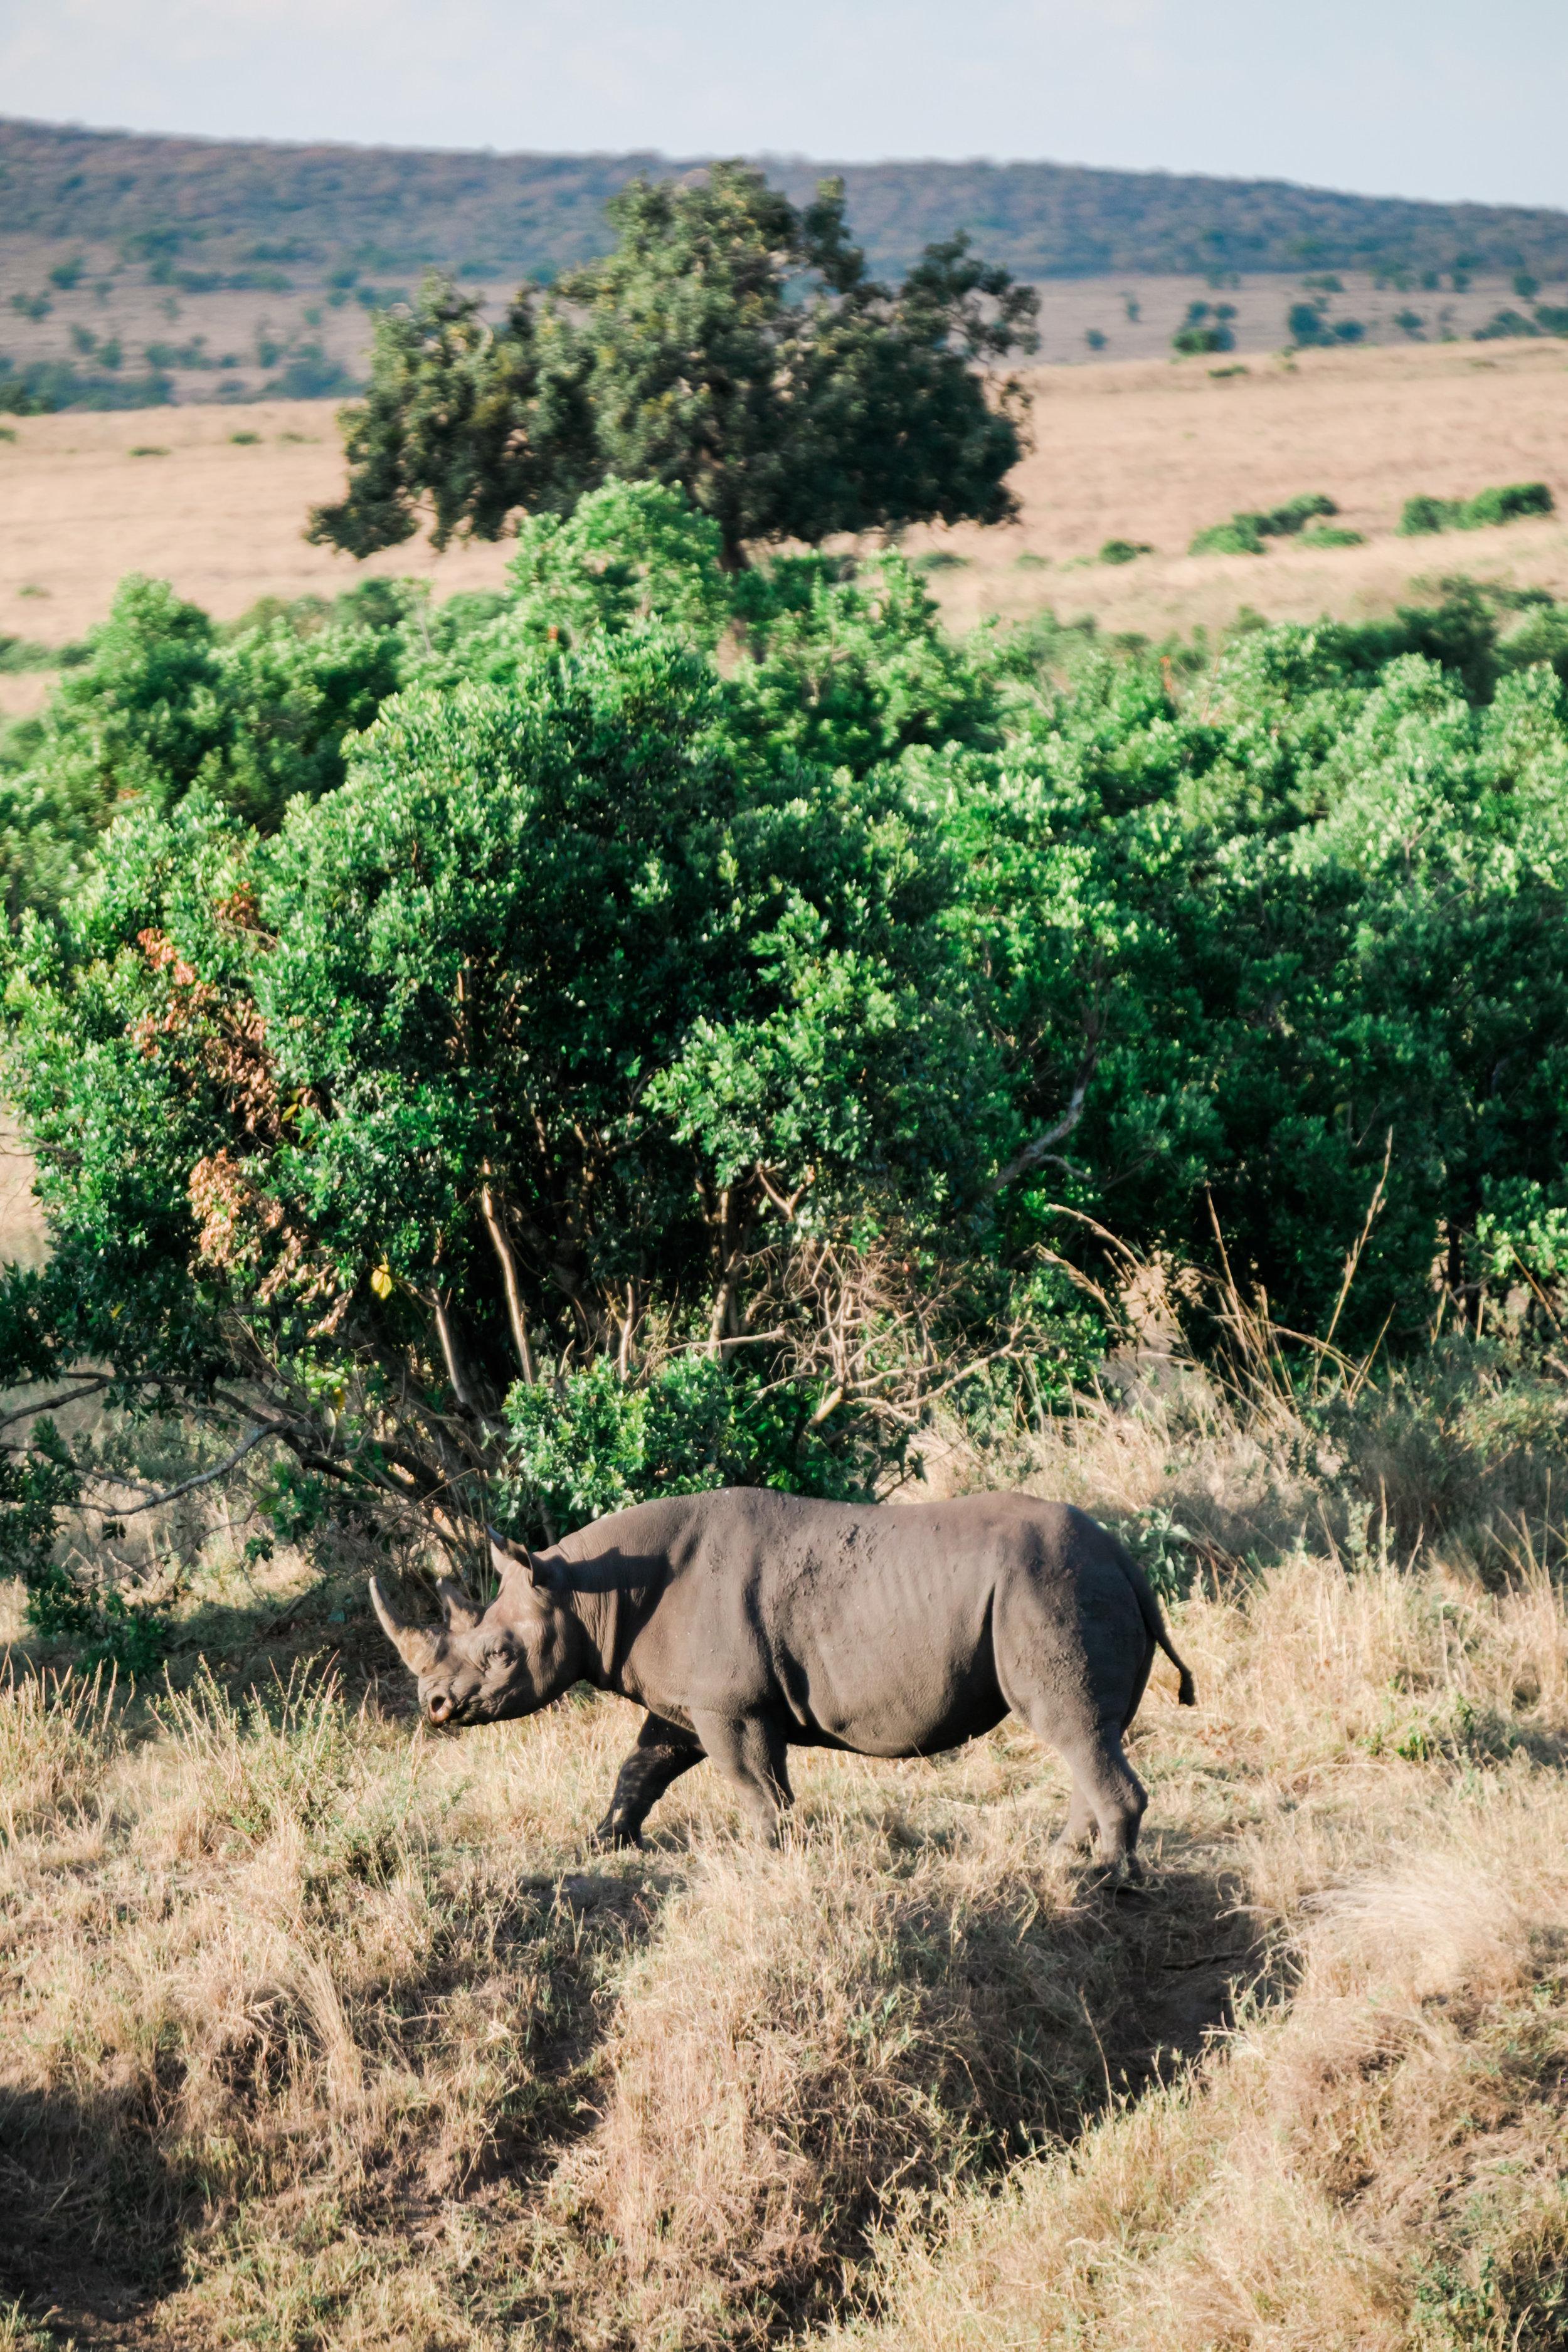 Rhino in Maasai Mara, Kenya Ph. Valorie Darling